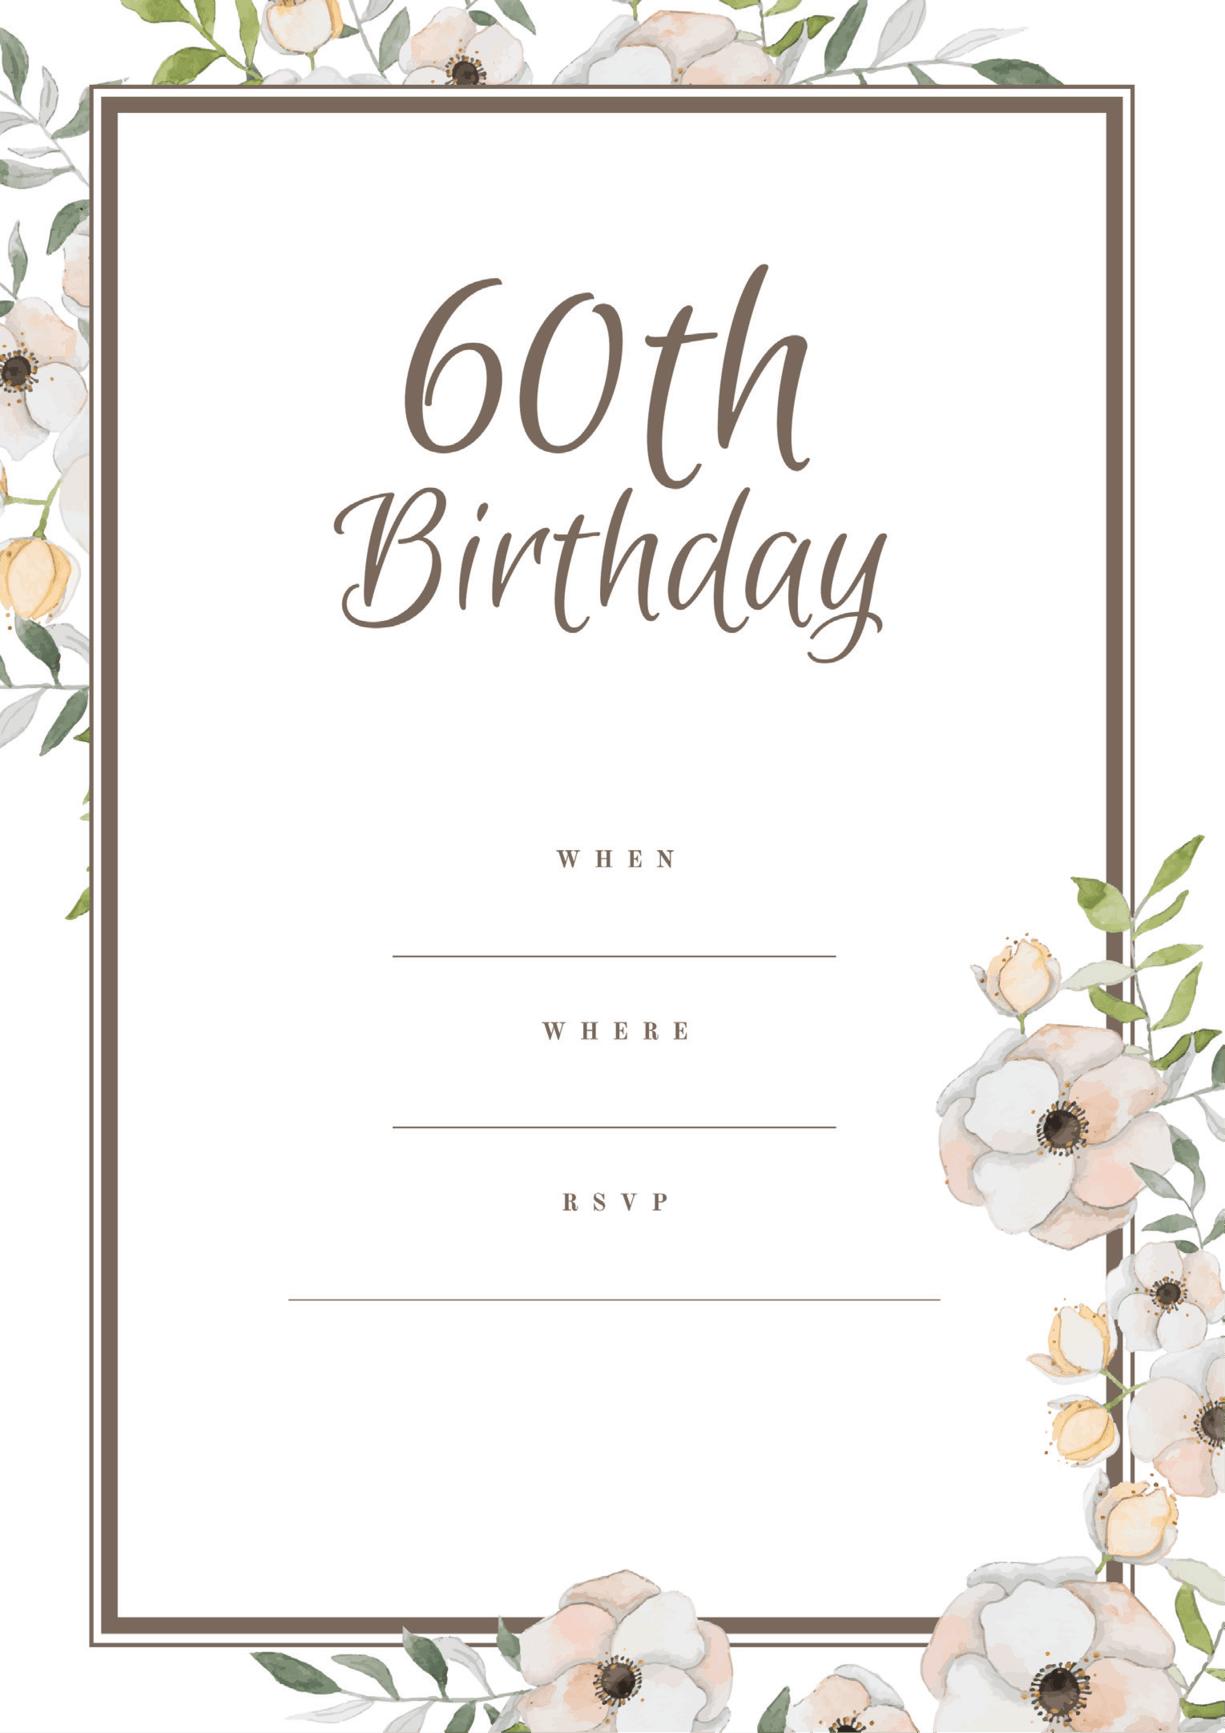 60th birthday invitation magnolia flower design